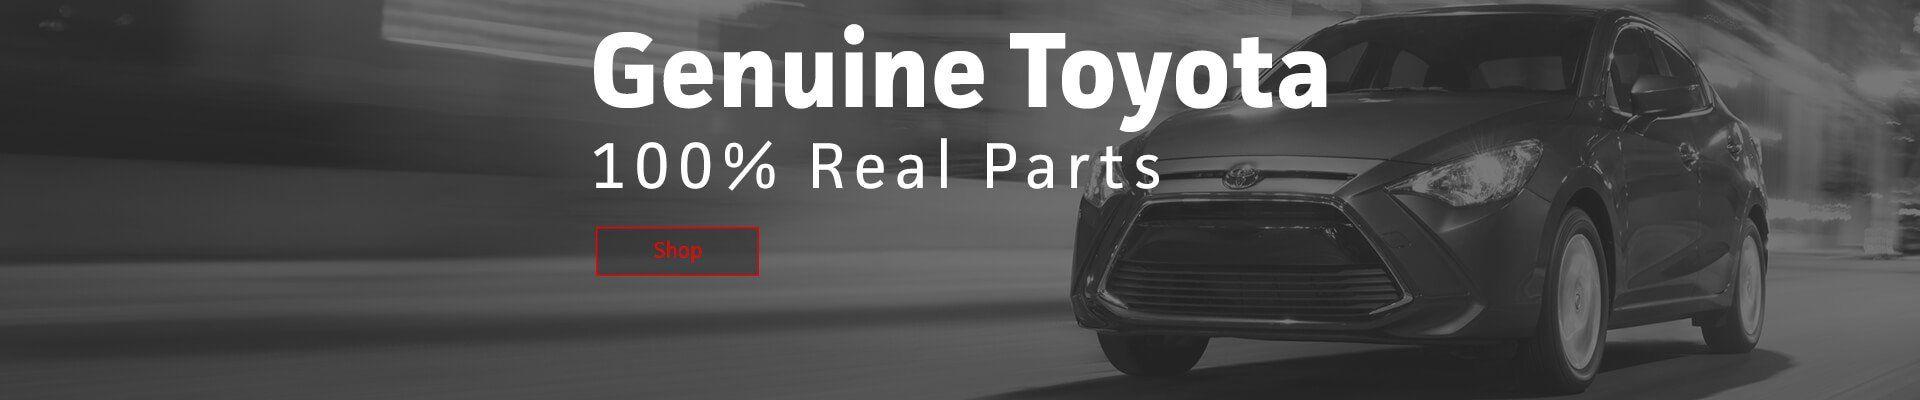 Shop Genuine Toyota Parts